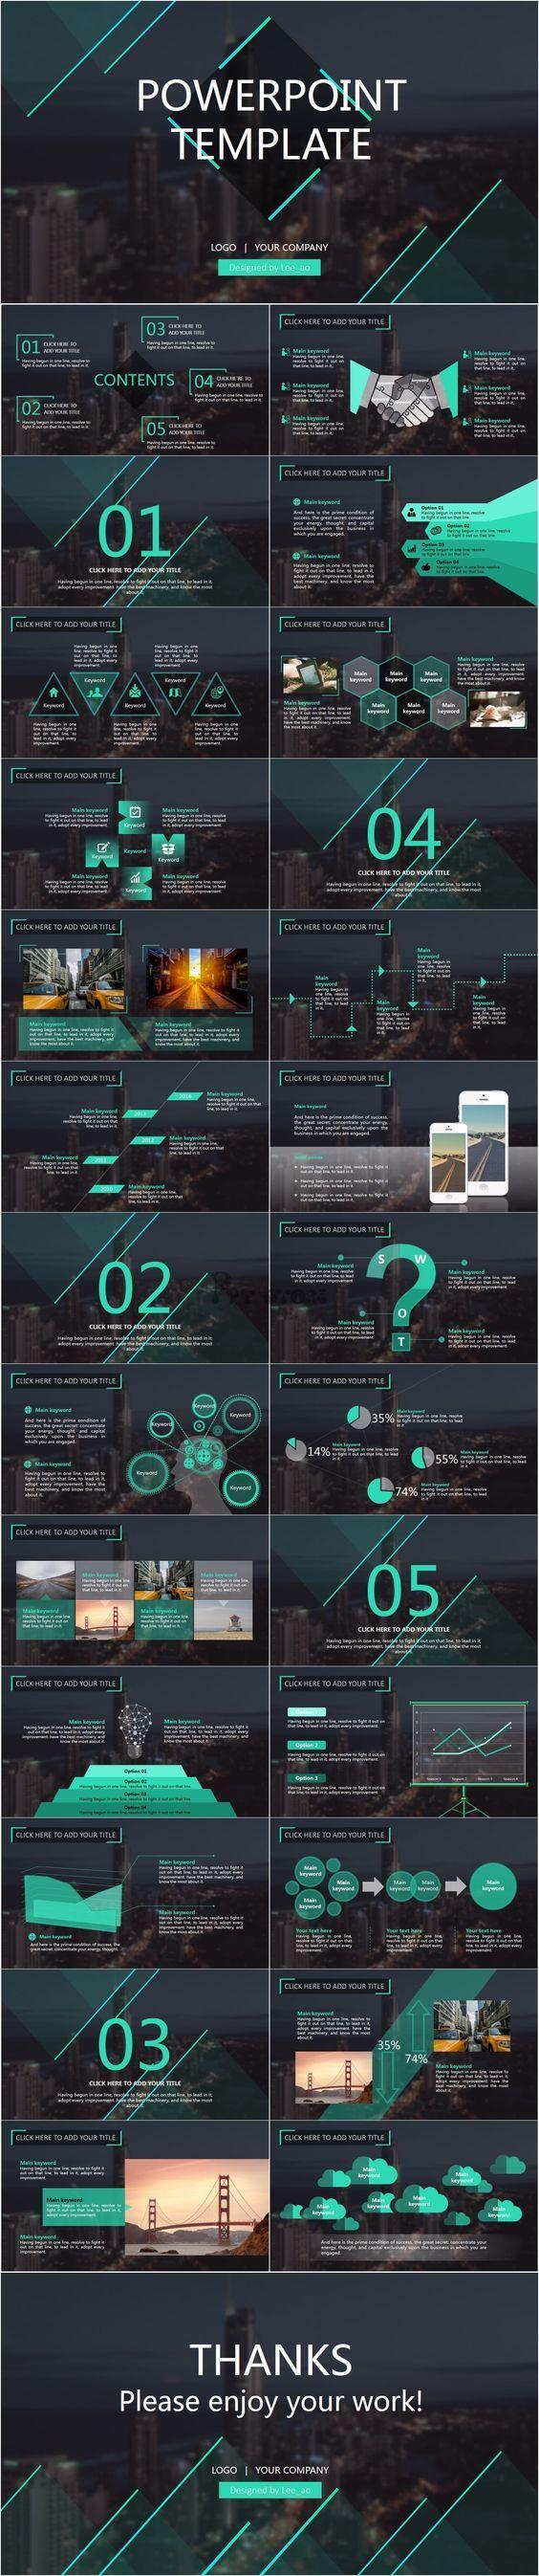 powerpoint template,download:http://www.pptstore.net/shangwu_ppt/11936.html: